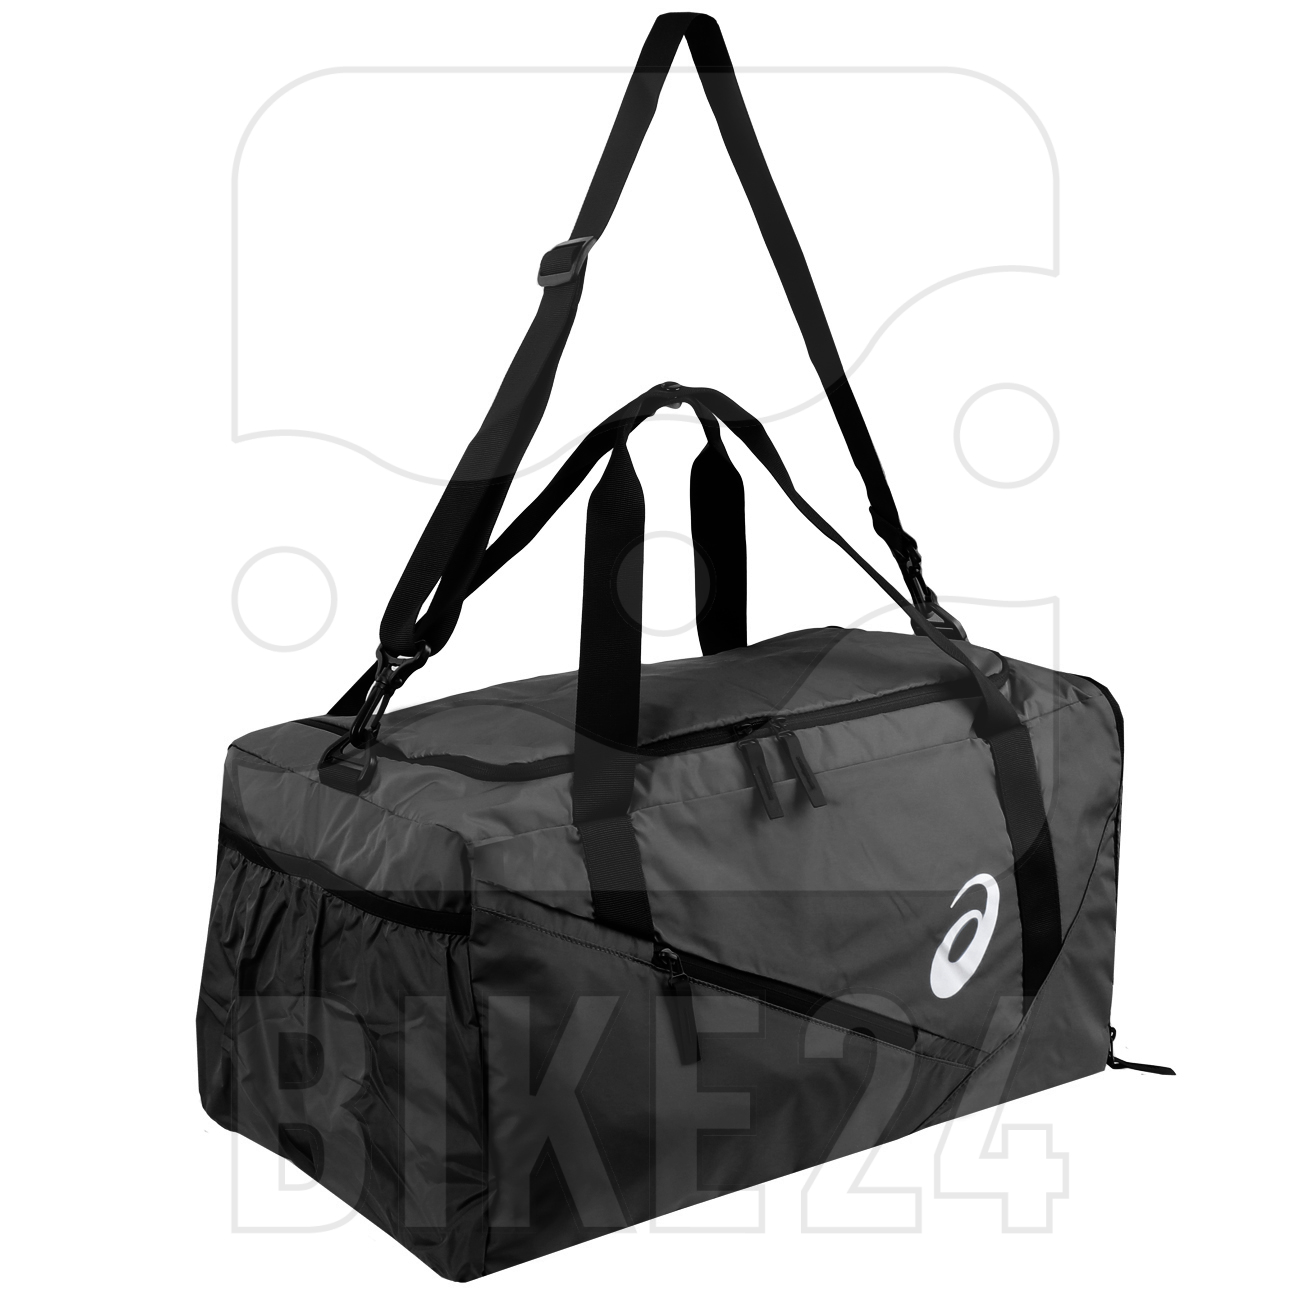 Image of asics Duffle Bag - Medium - performance black